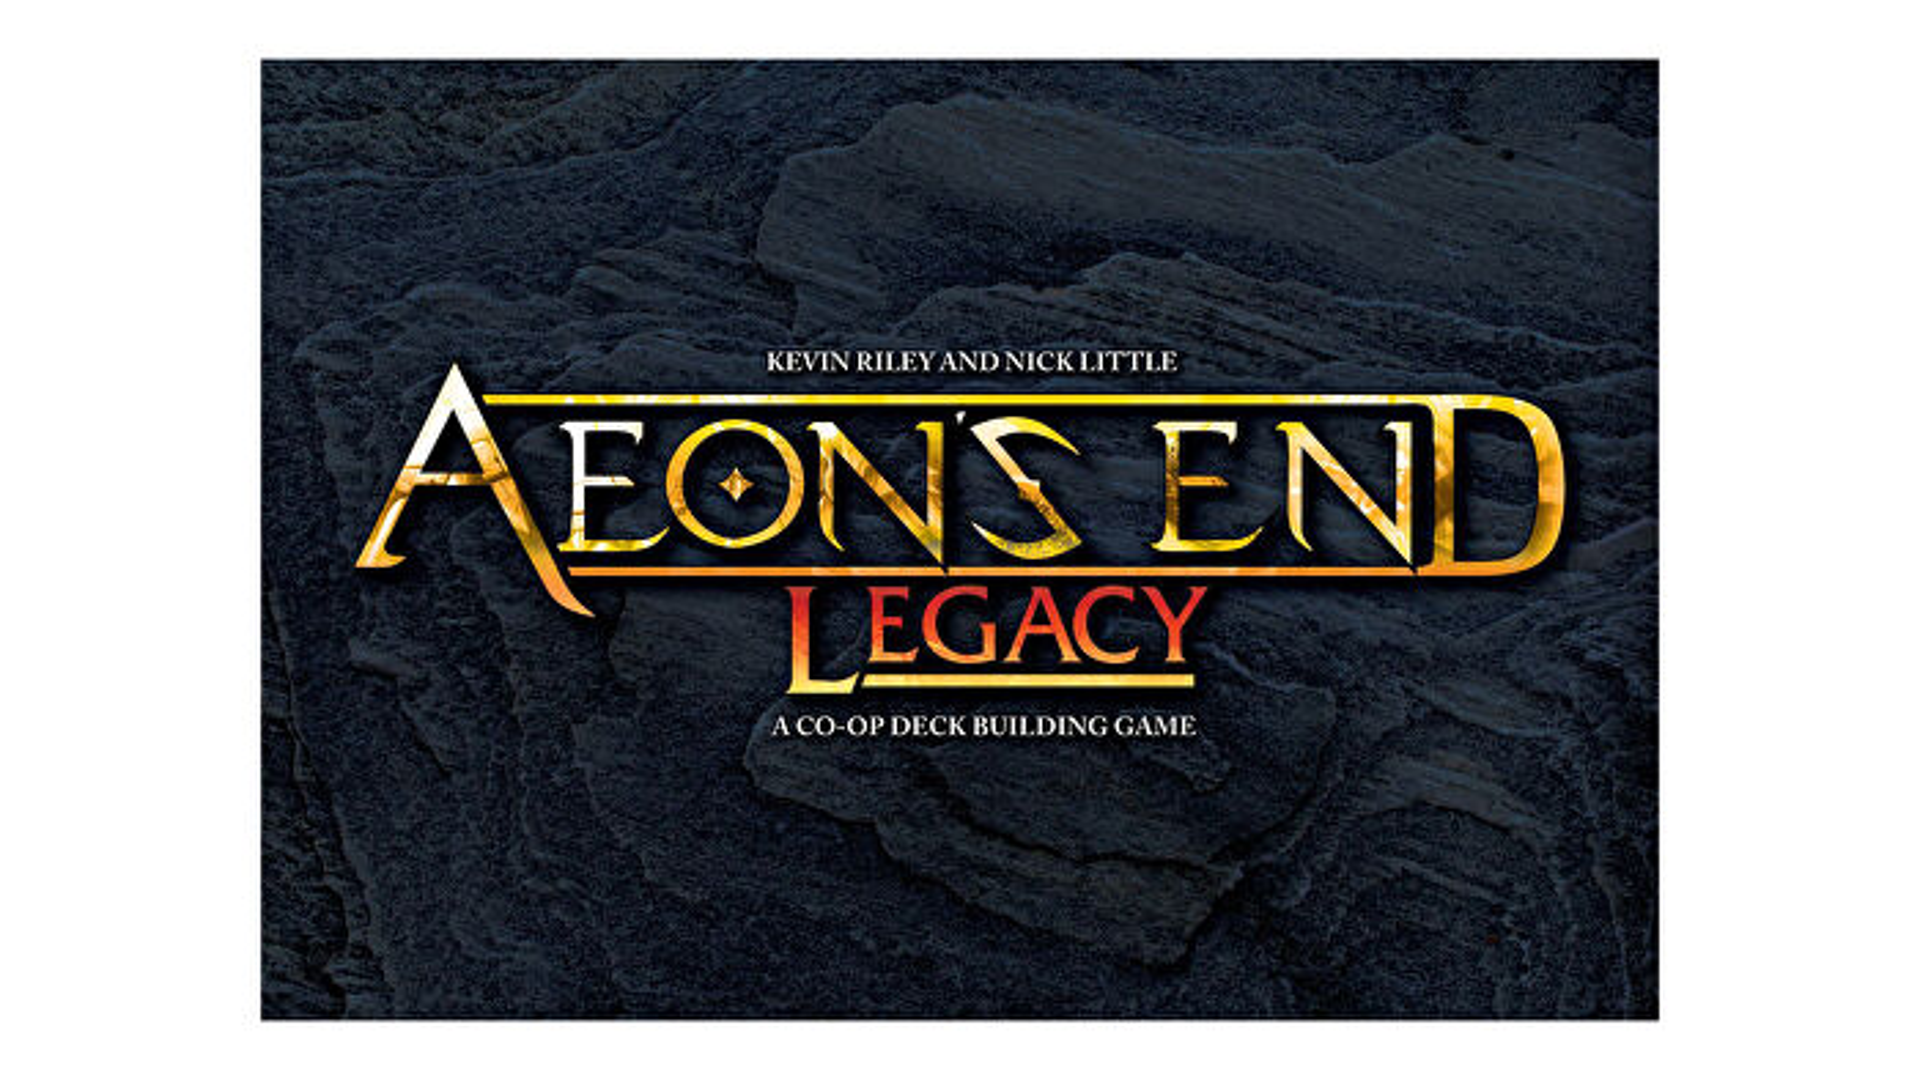 Aeons End Legacy board game box